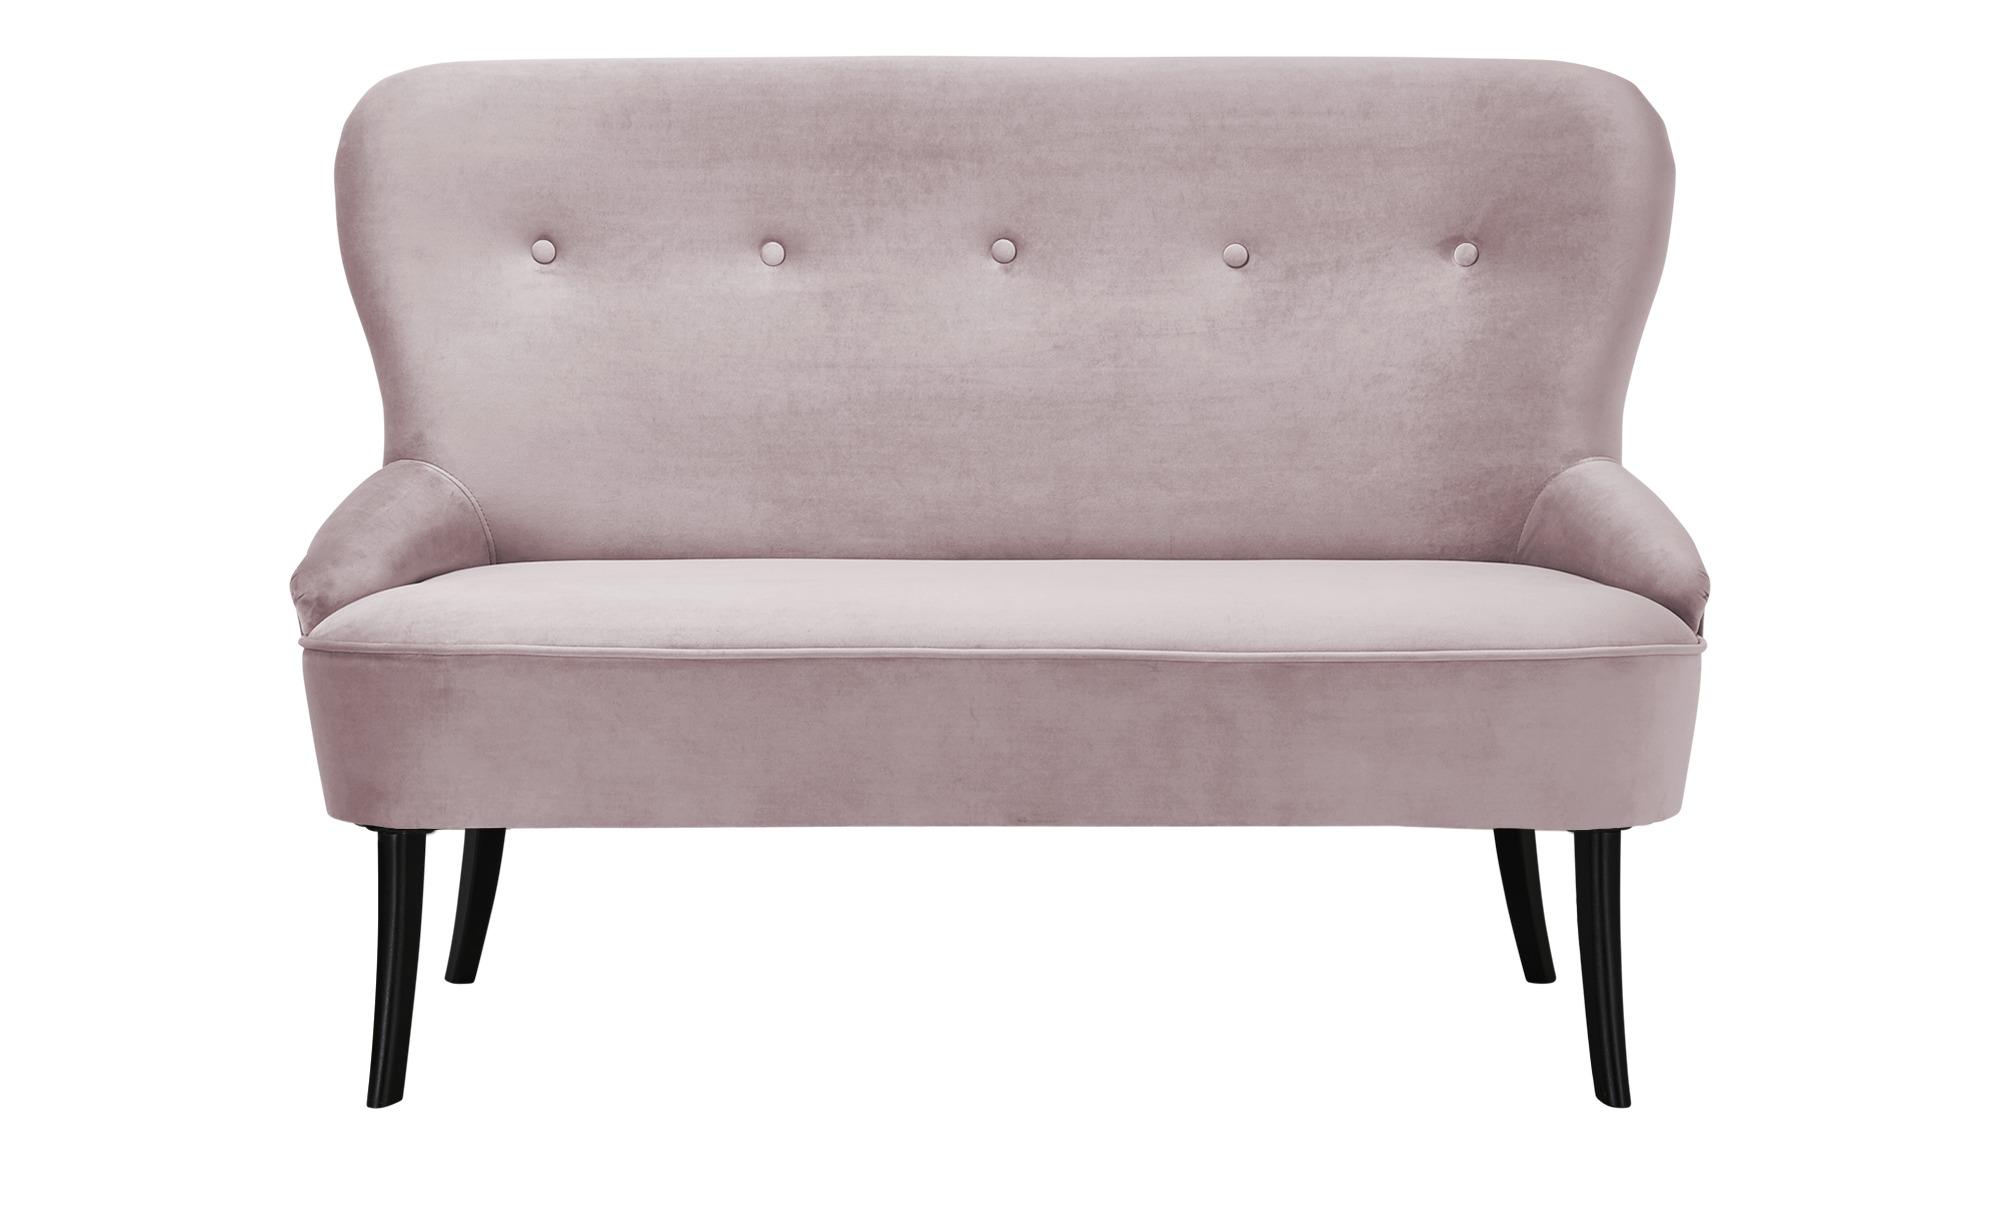 smart Sofa  Renia ¦ rosa/pink ¦ Maße (cm): B: 130 H: 89 T: 72 Polstermöbel > Sofas > 2-Sitzer - Höffner